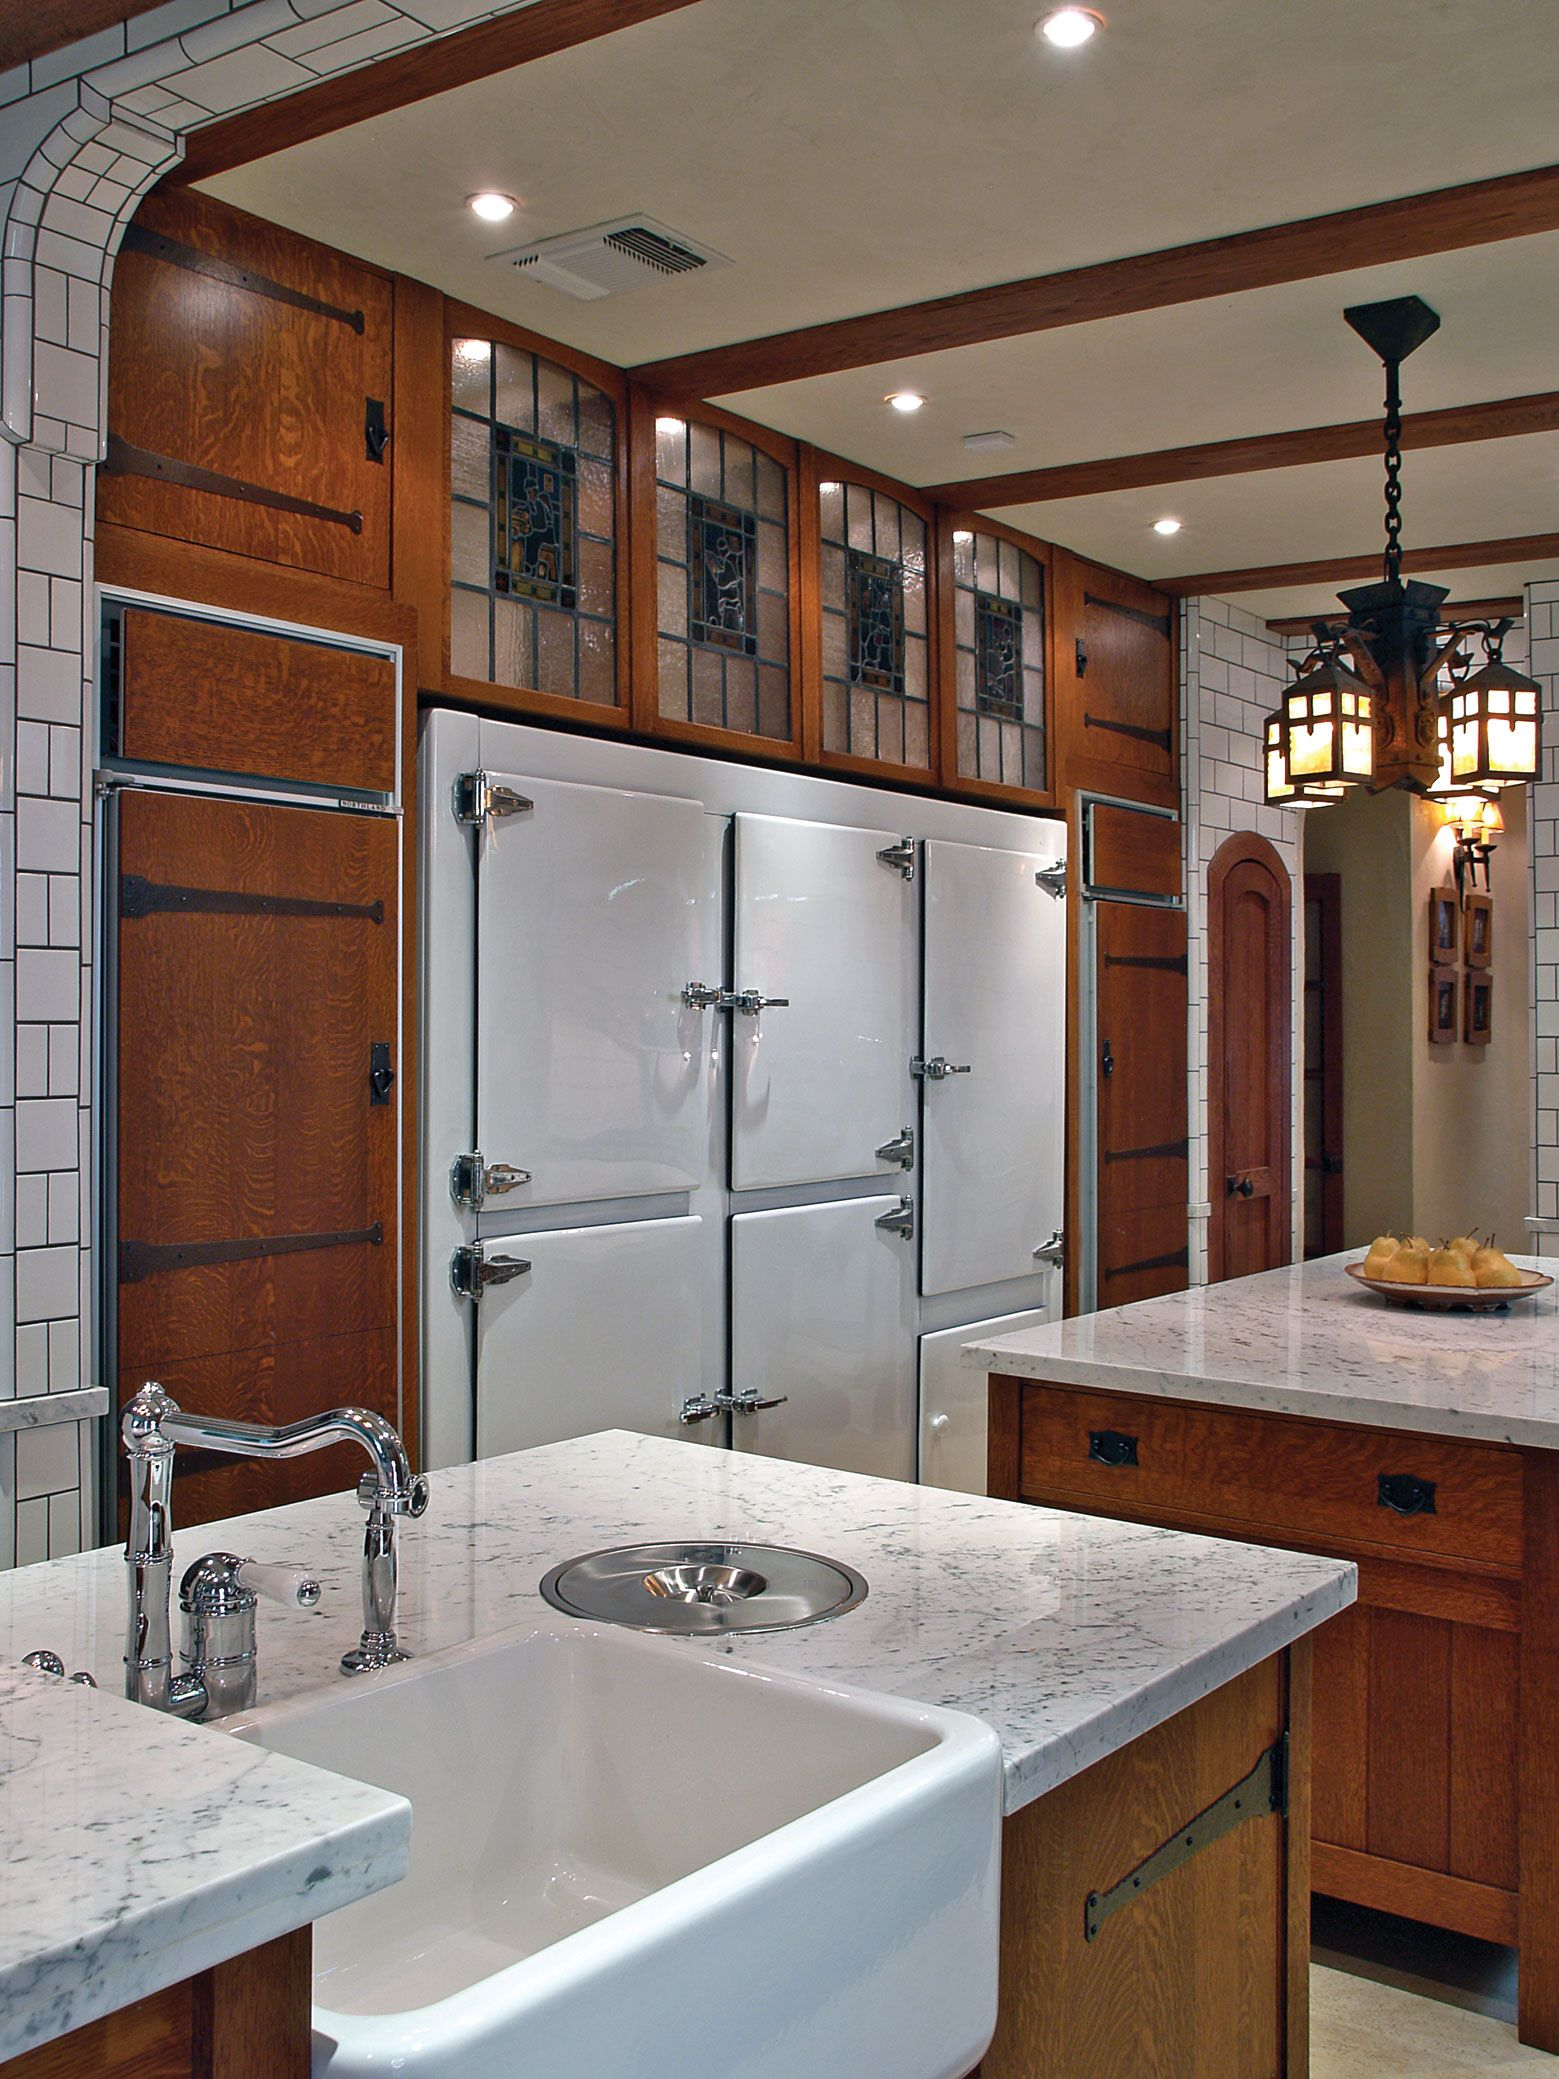 Peterborough Kitchen Cabinets Built In Arts Crafts Spanish Revival Bungalow Oak Kitchen